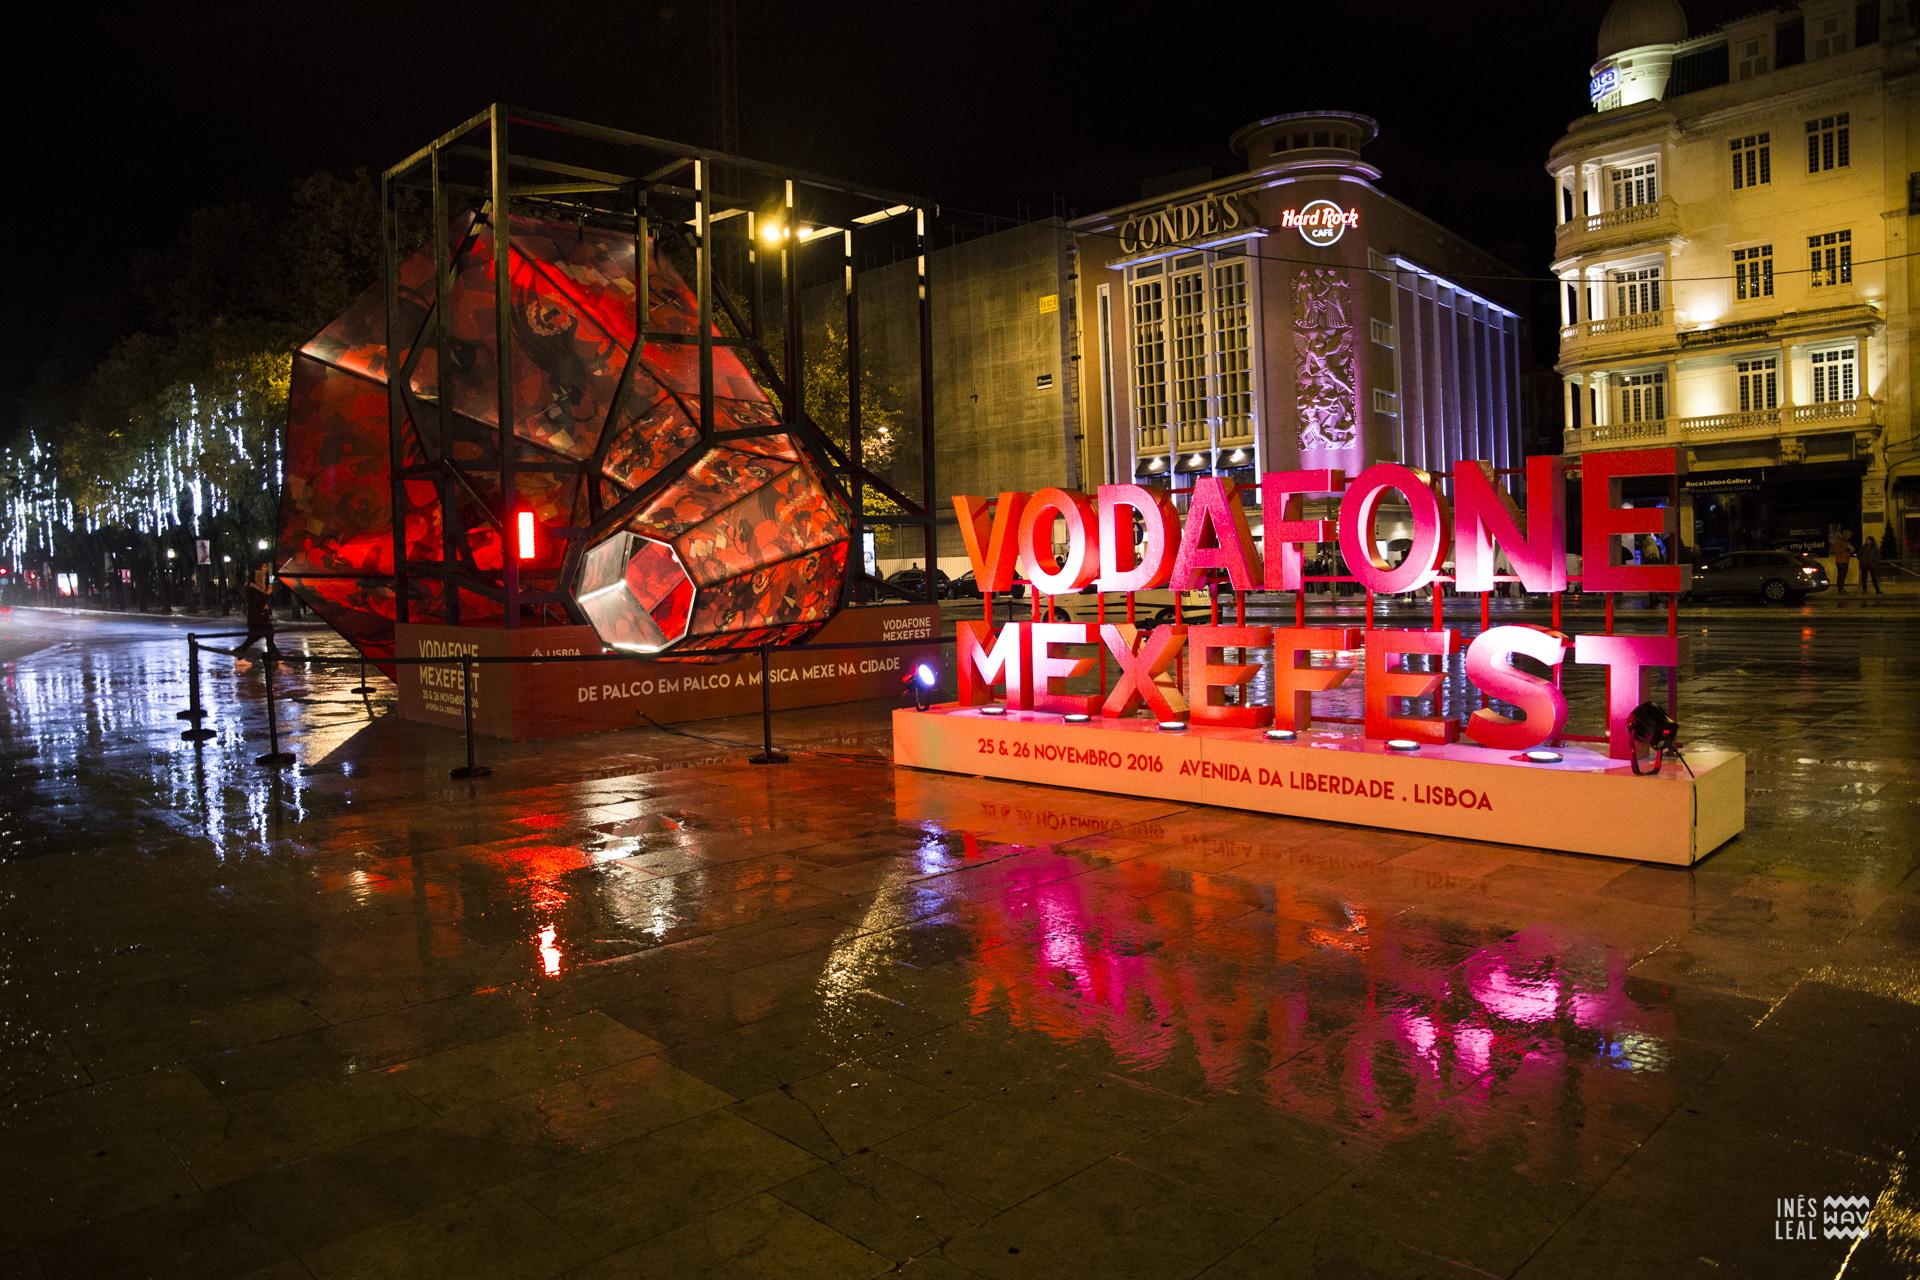 Vodafone Mexefest 2016 [25/26Nov] Foto-galerias